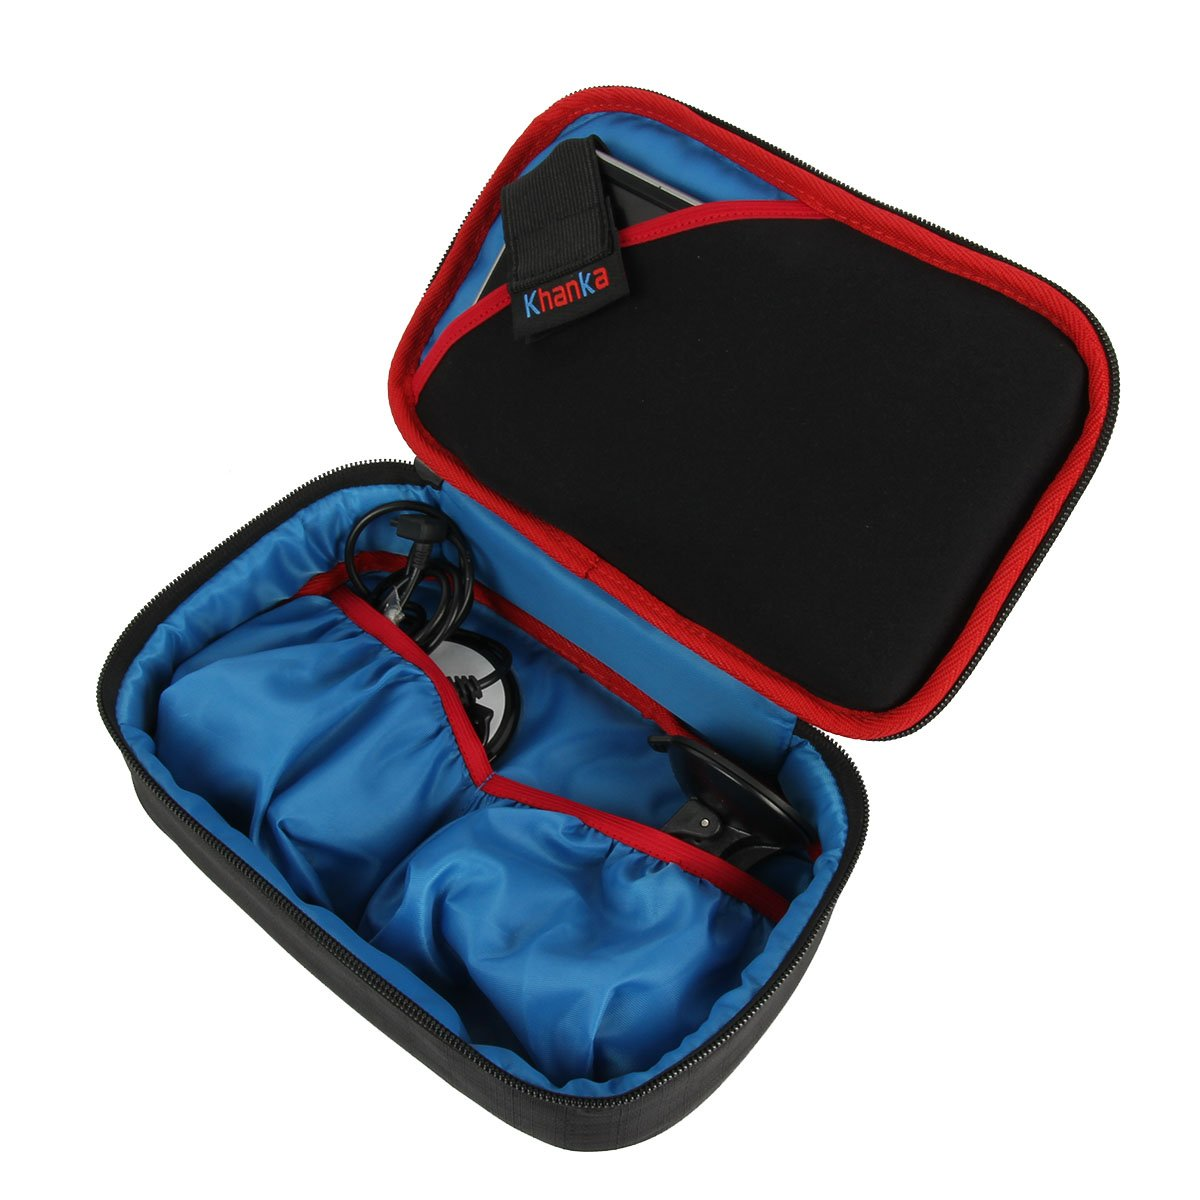 Khanka Hard Travel Case Replacement for 6-7'' inch Garmin DriveSmart 70 NA LMT GPS Navigator System (Soft) by khanka